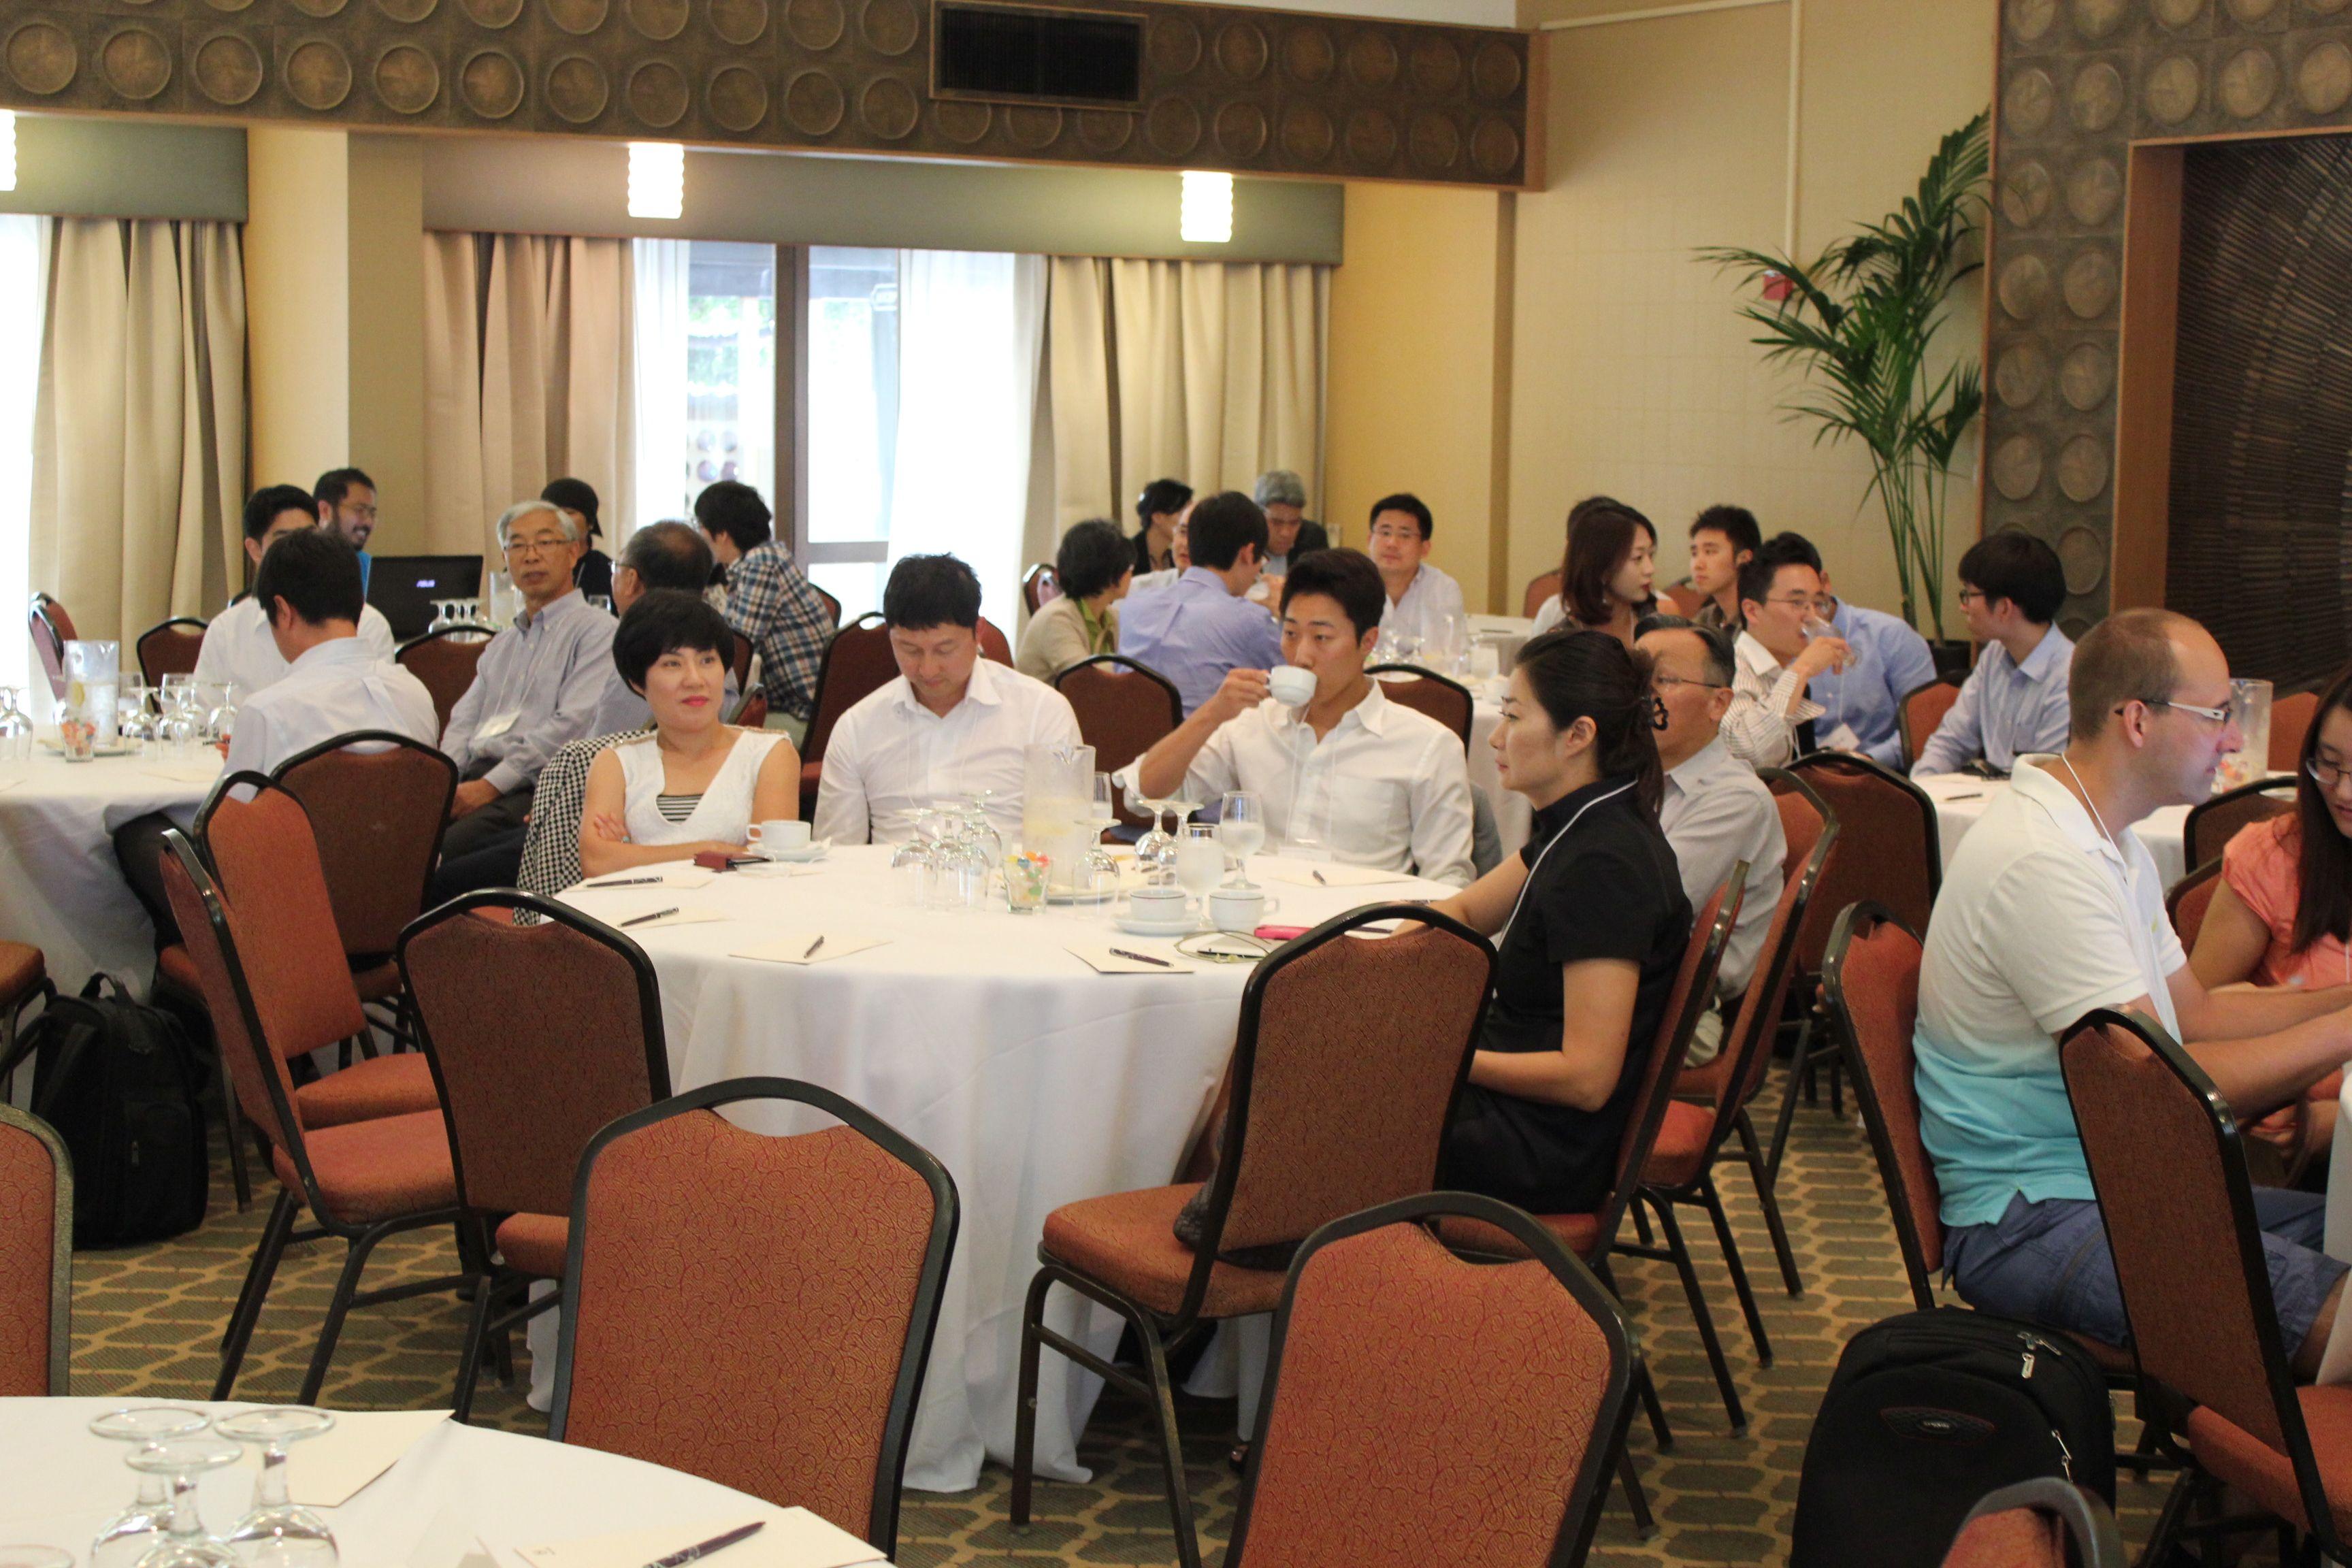 International Value Workshop 코리아 벤처창업 투자센터 개소식 - KOTRA Silicon Valley 코트라 실리콘밸리